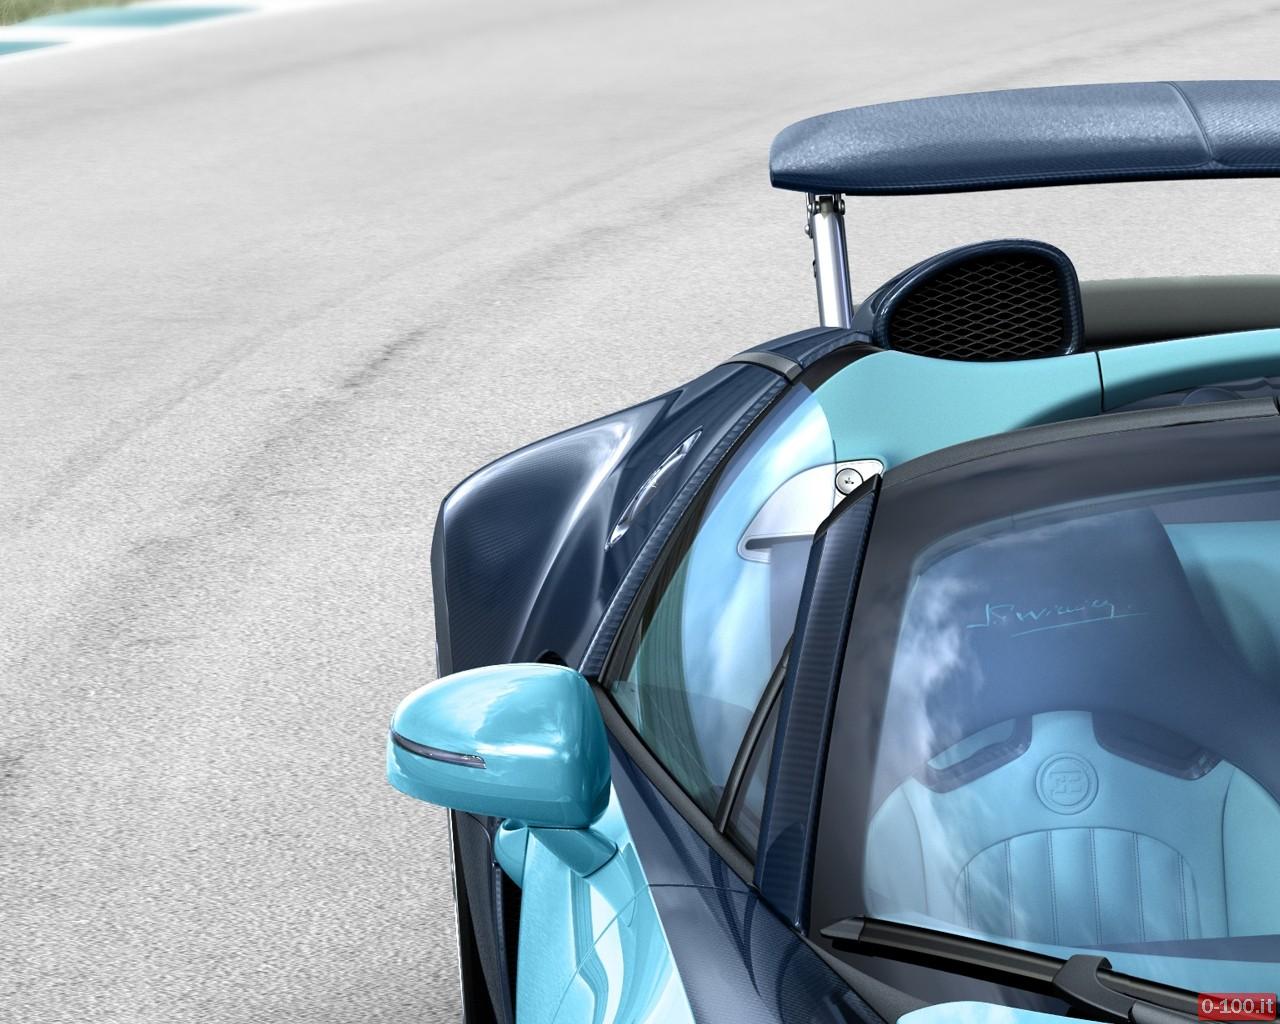 bugatti-veyron-legend-jean-pierre-wimille-0-100_8